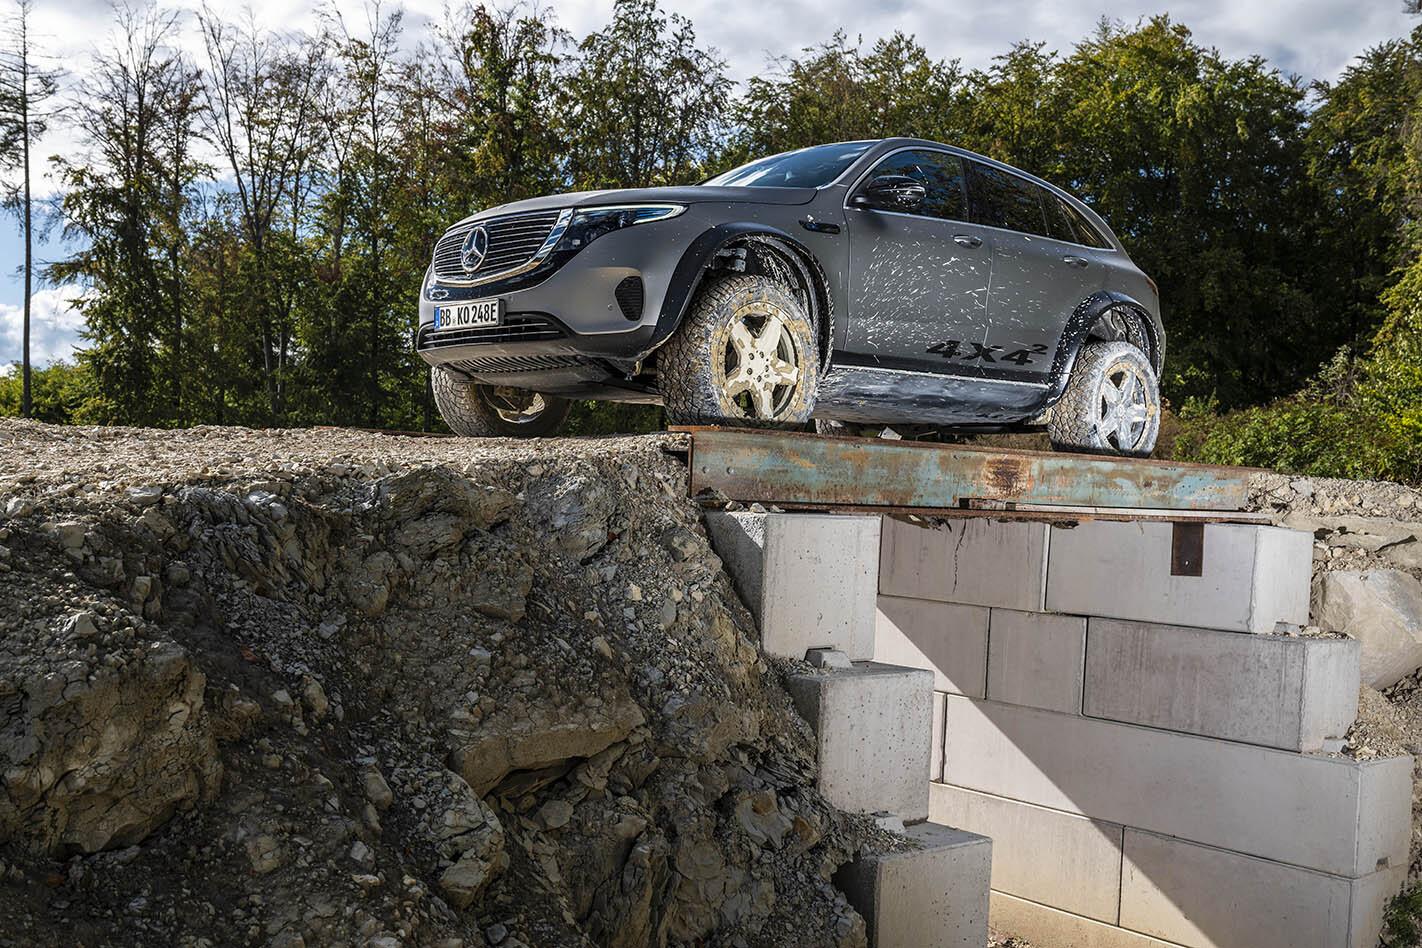 MORE: Mercedes-Benz G 500 4x4² review